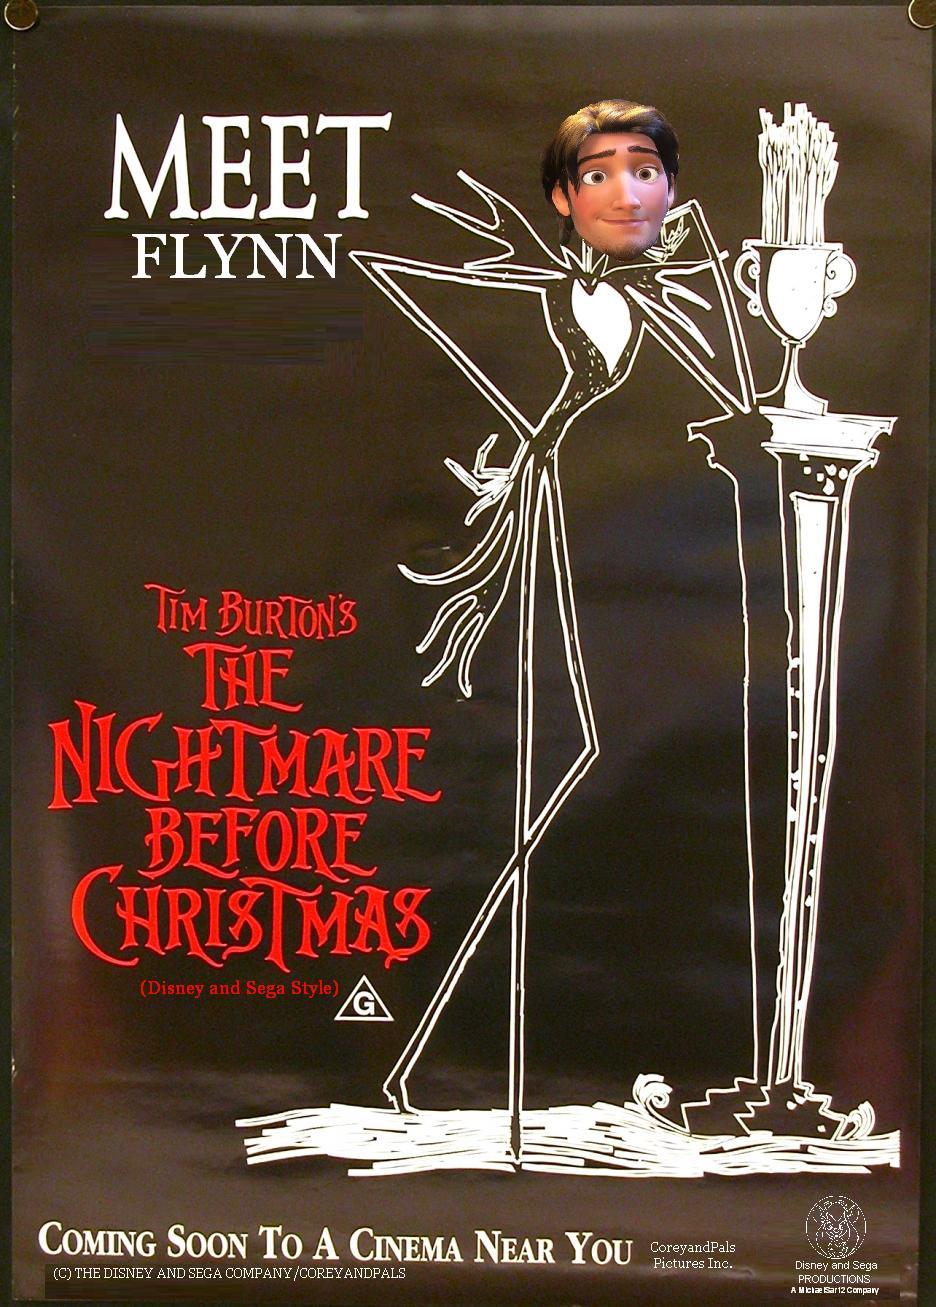 The Nightmare Before Christmas (Disney and Sega Style) | The Parody ...